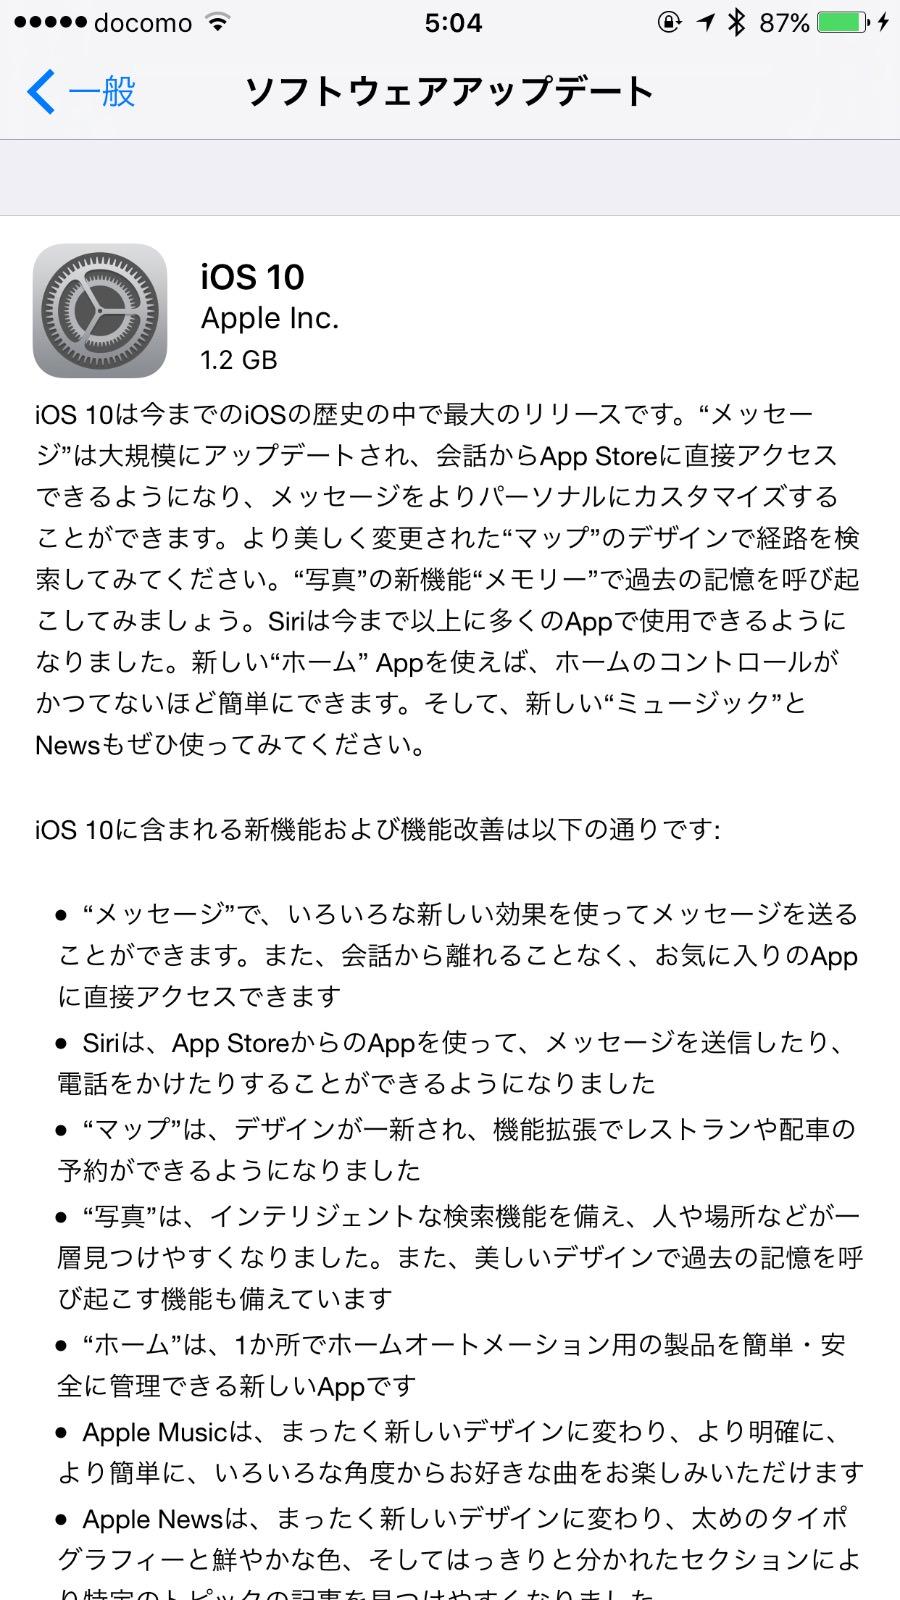 Ios 10 release 8437